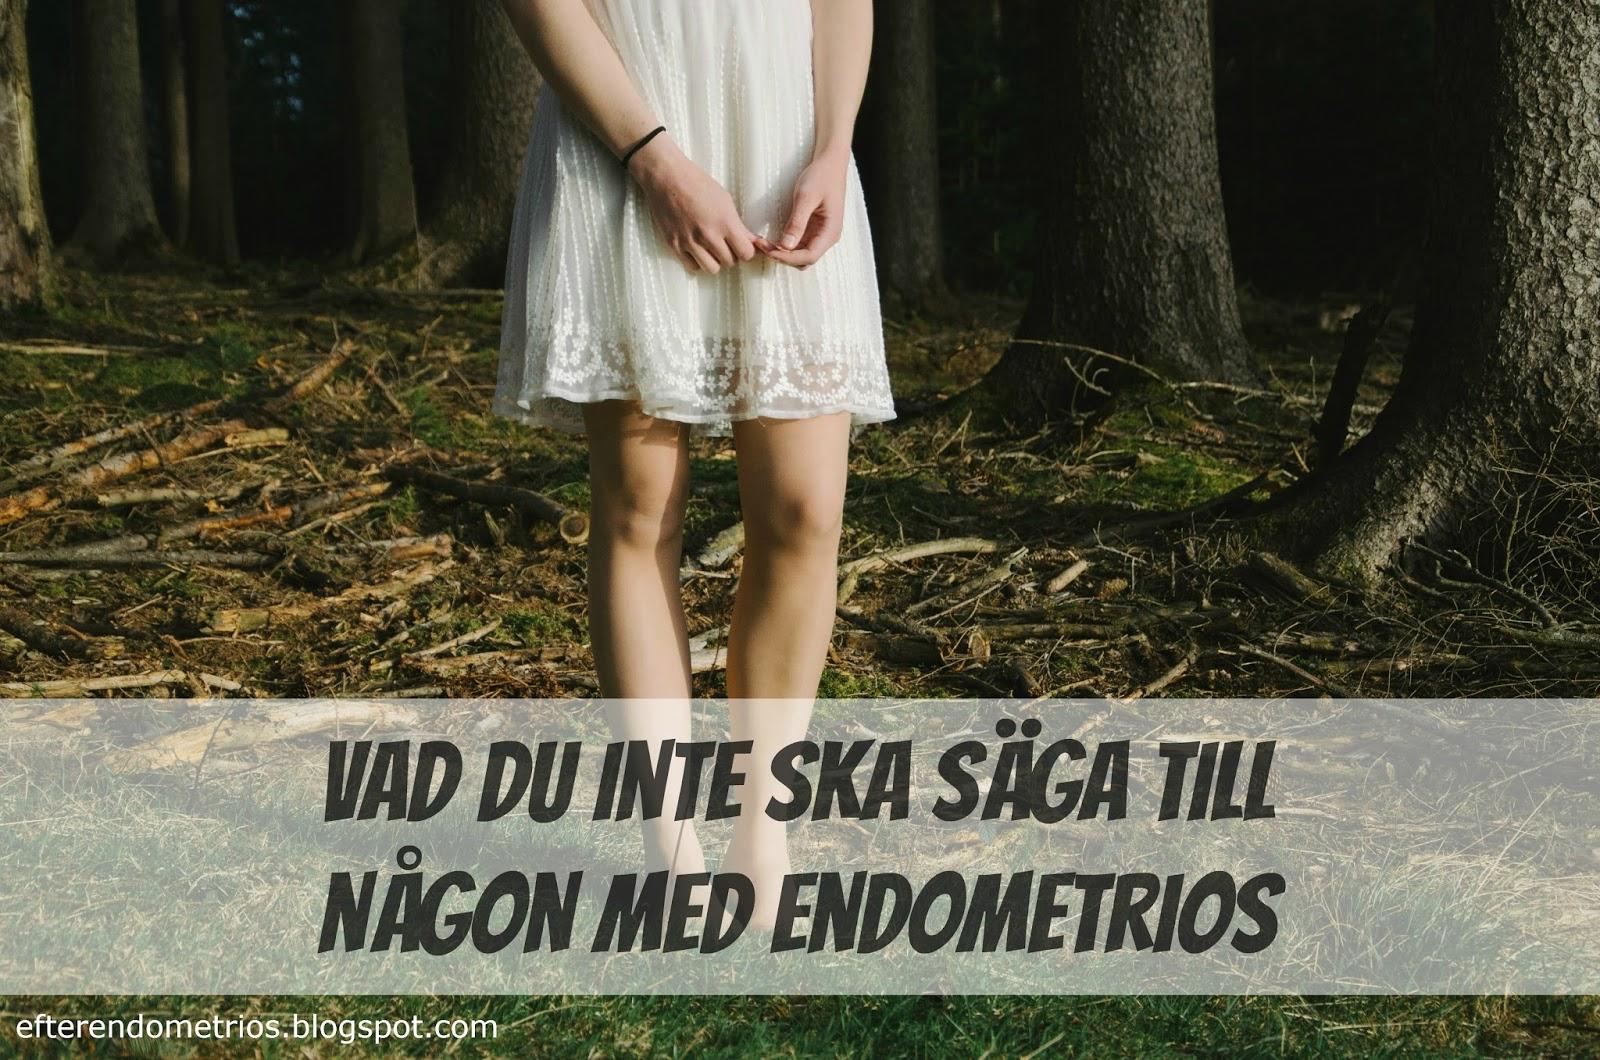 endometrios smärta i benen